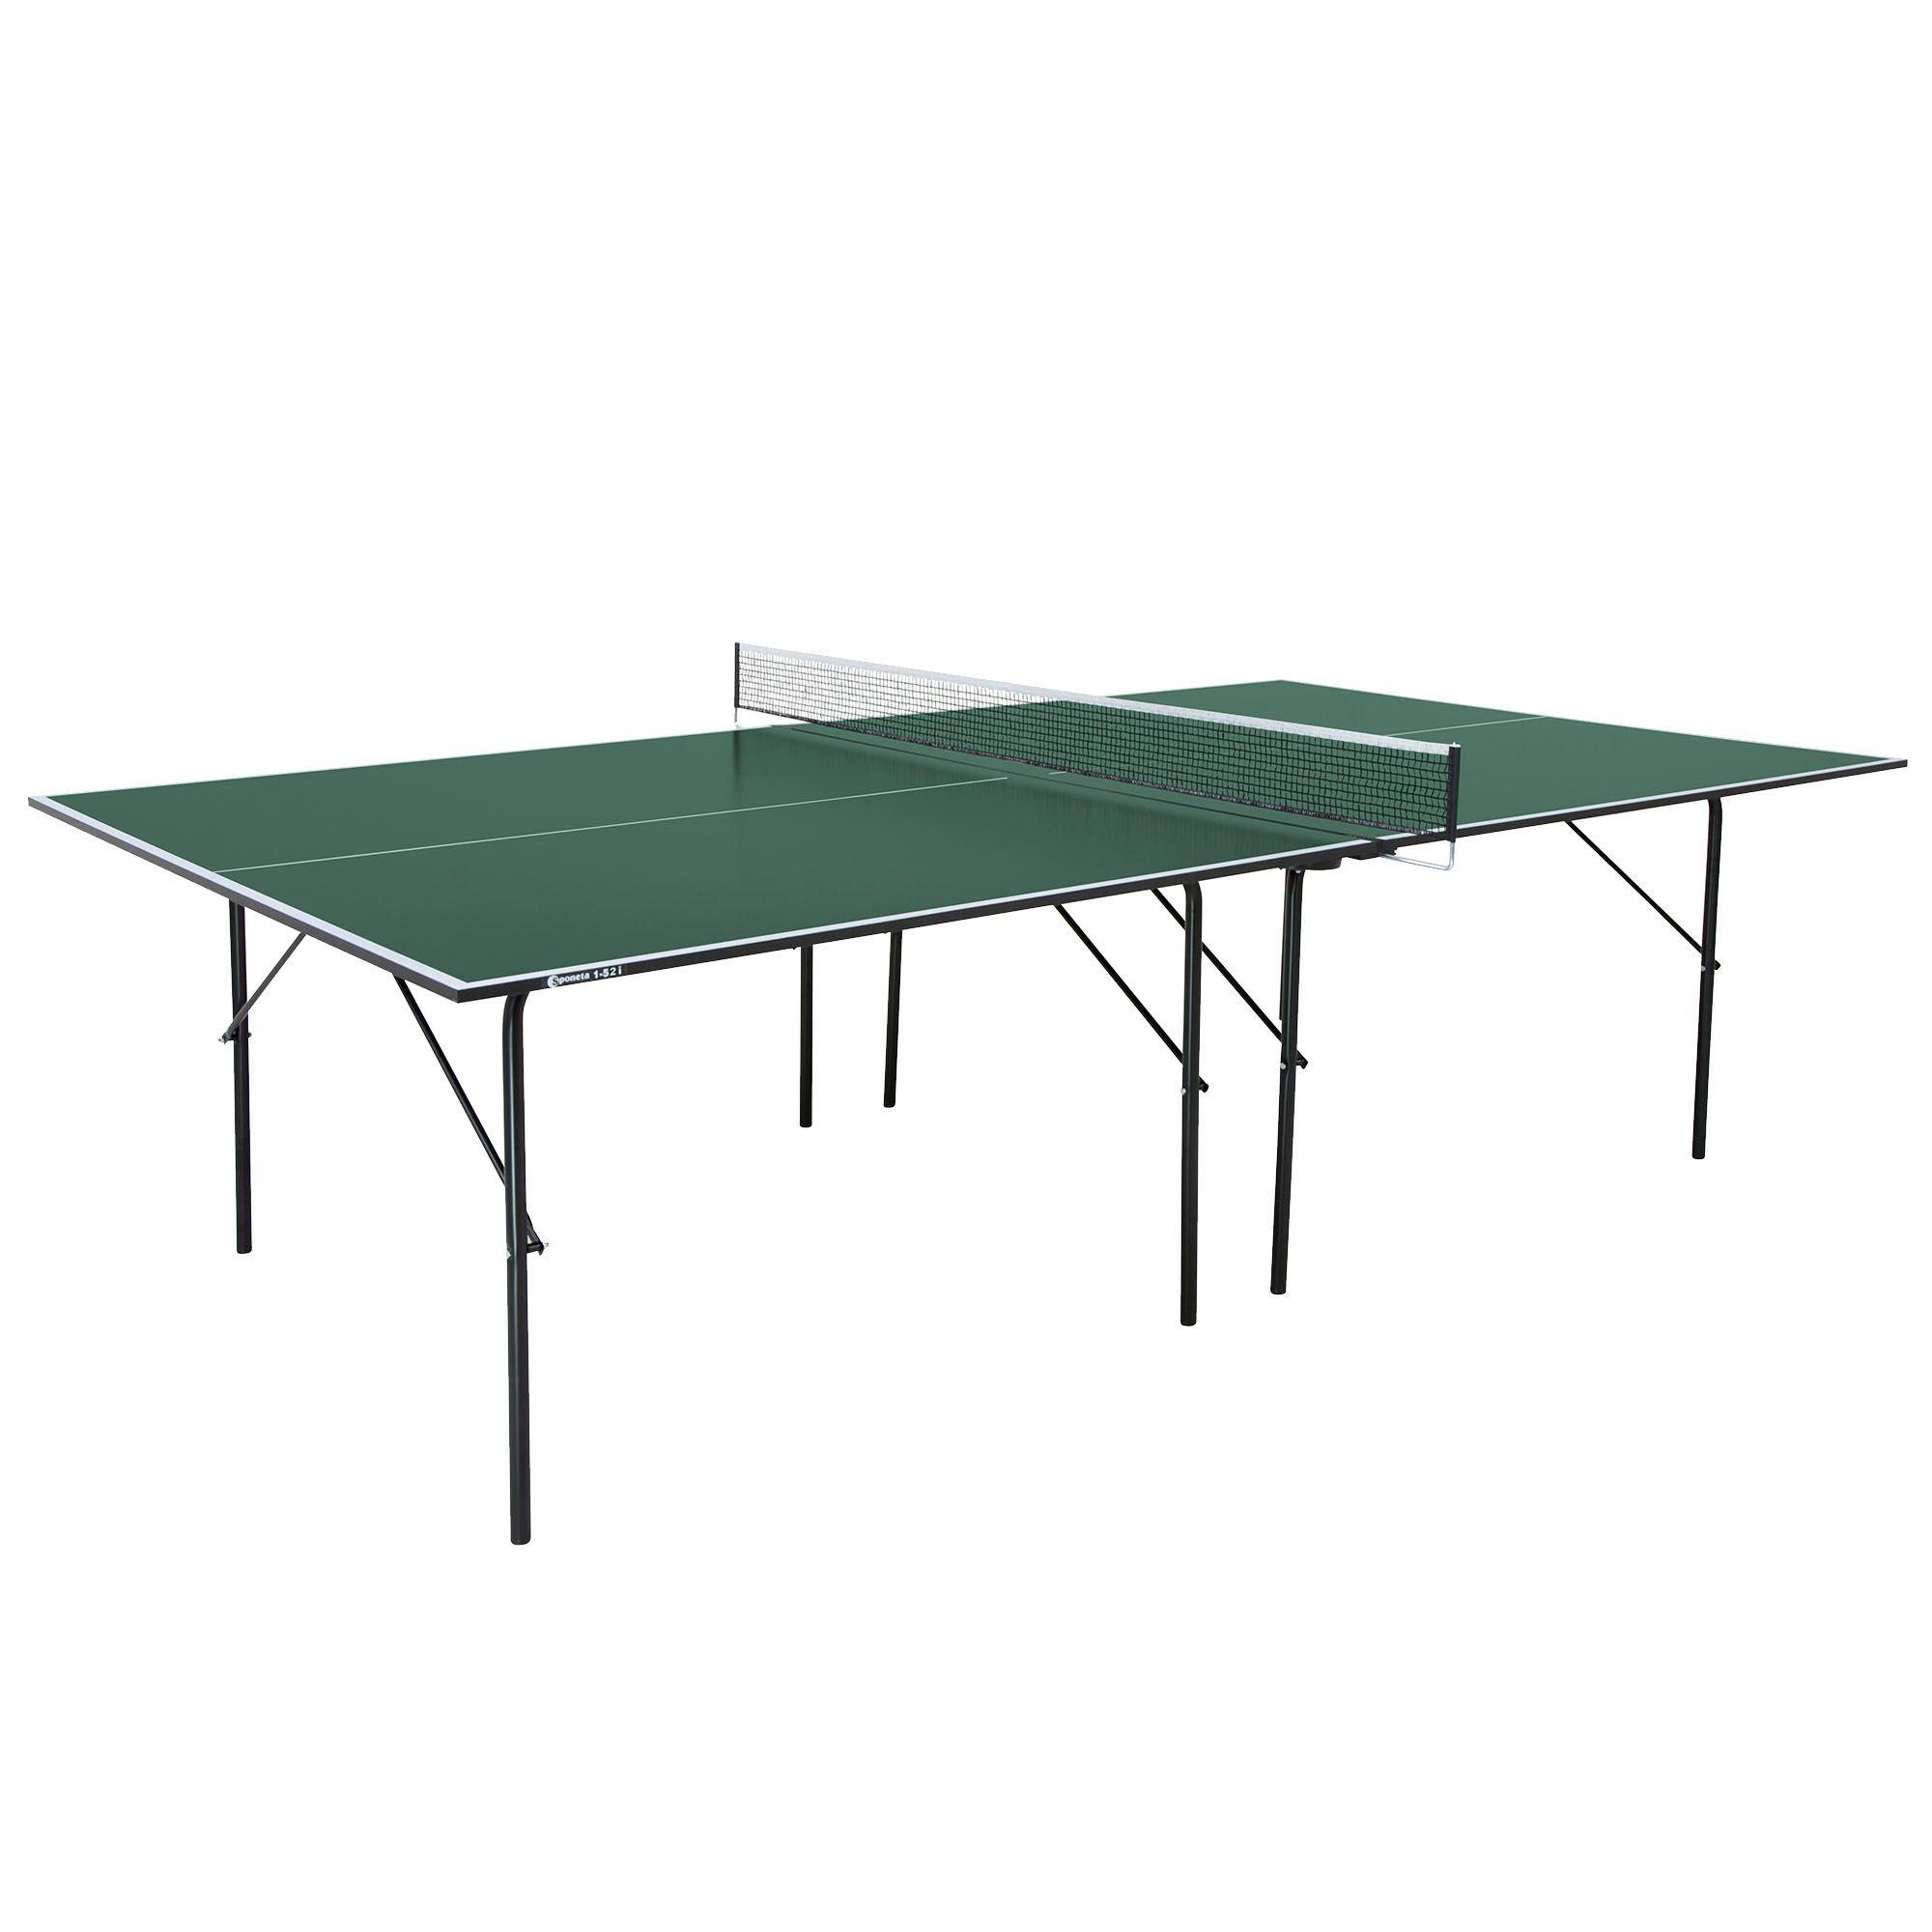 Sponeta hobbyline indoor table tennis table - Sponeta table tennis table ...